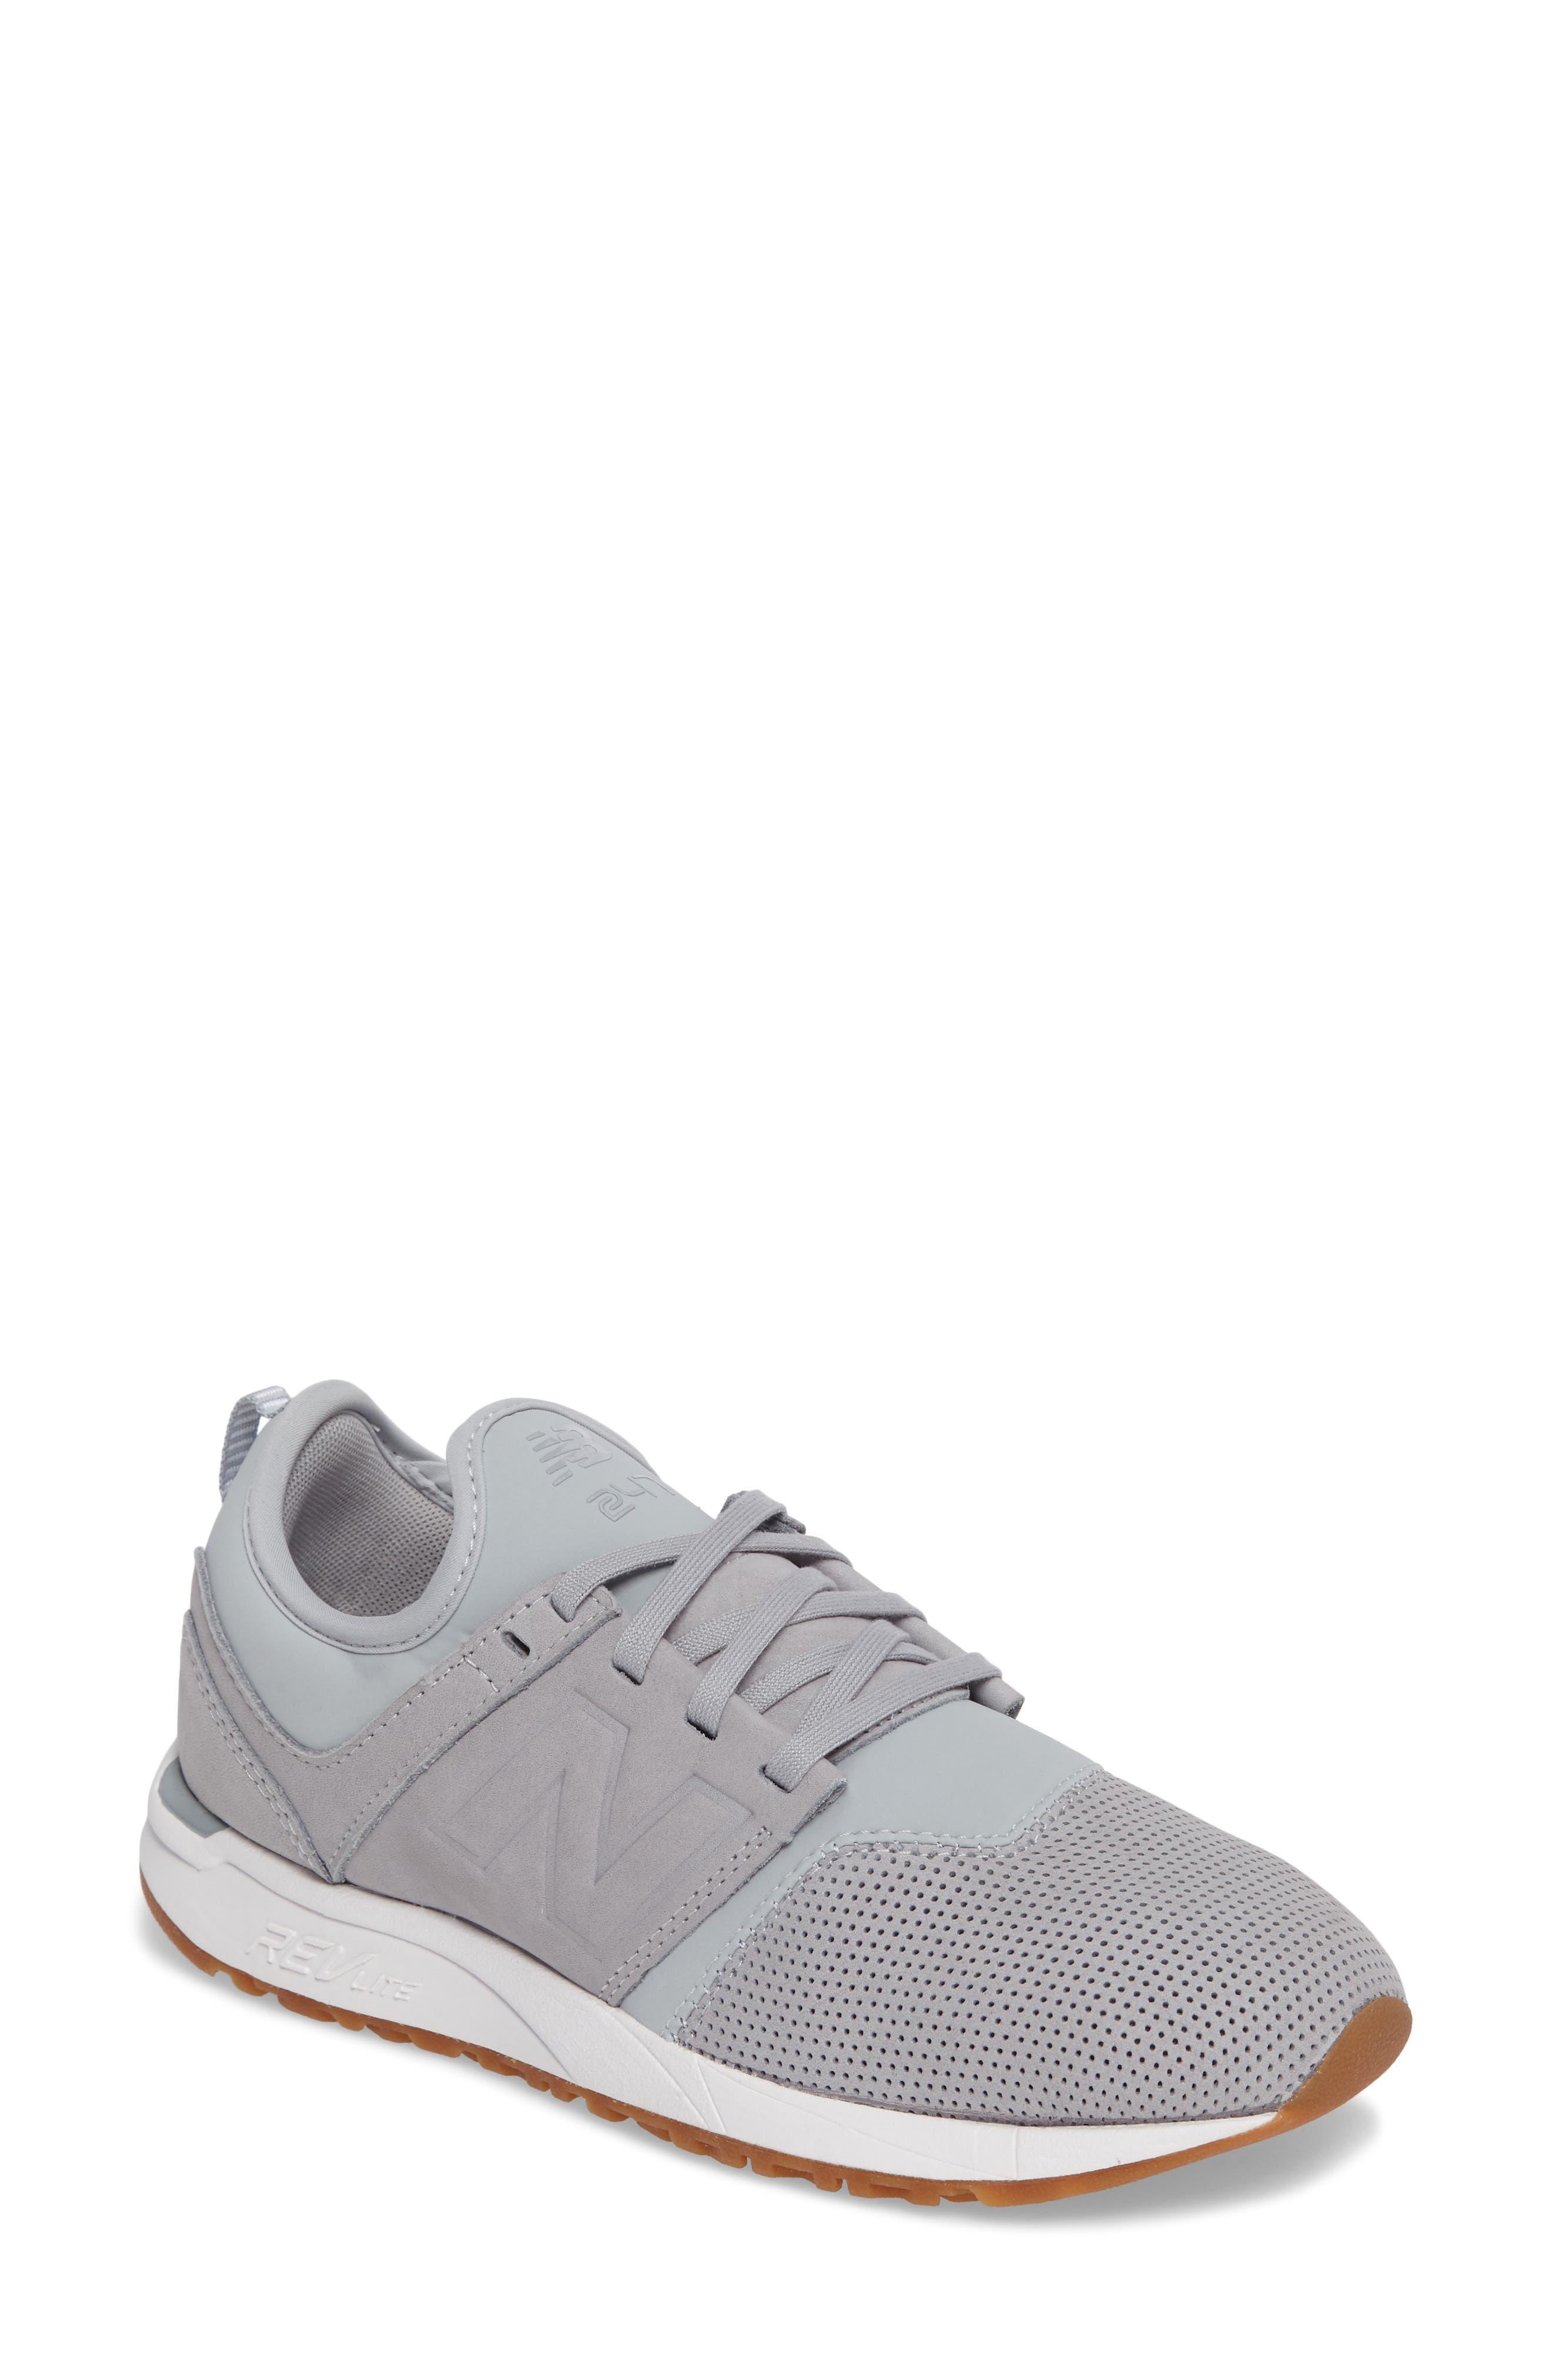 Alternate Image 1 Selected - New Balance Sport Style 247 Sneaker (Women)